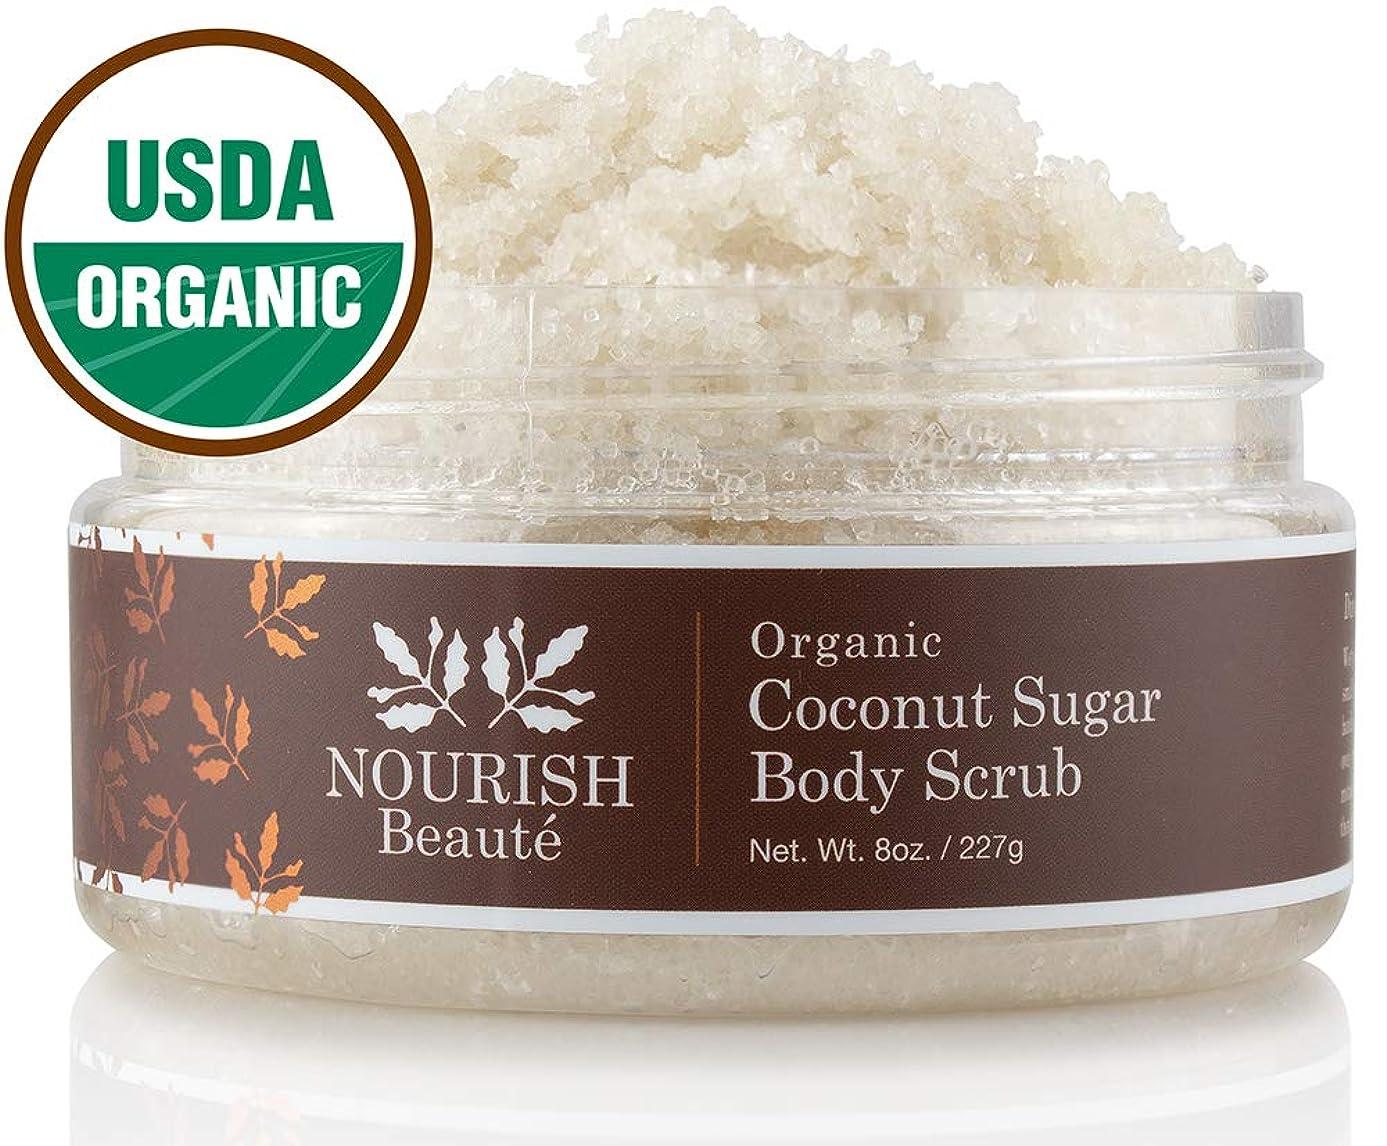 Nourish Beaute Organic Sugar Body Scrub That Exfoliates, Hydrates and Moisturizes Skin While Improving Skin Tone and Texture, 8 oz Coconut